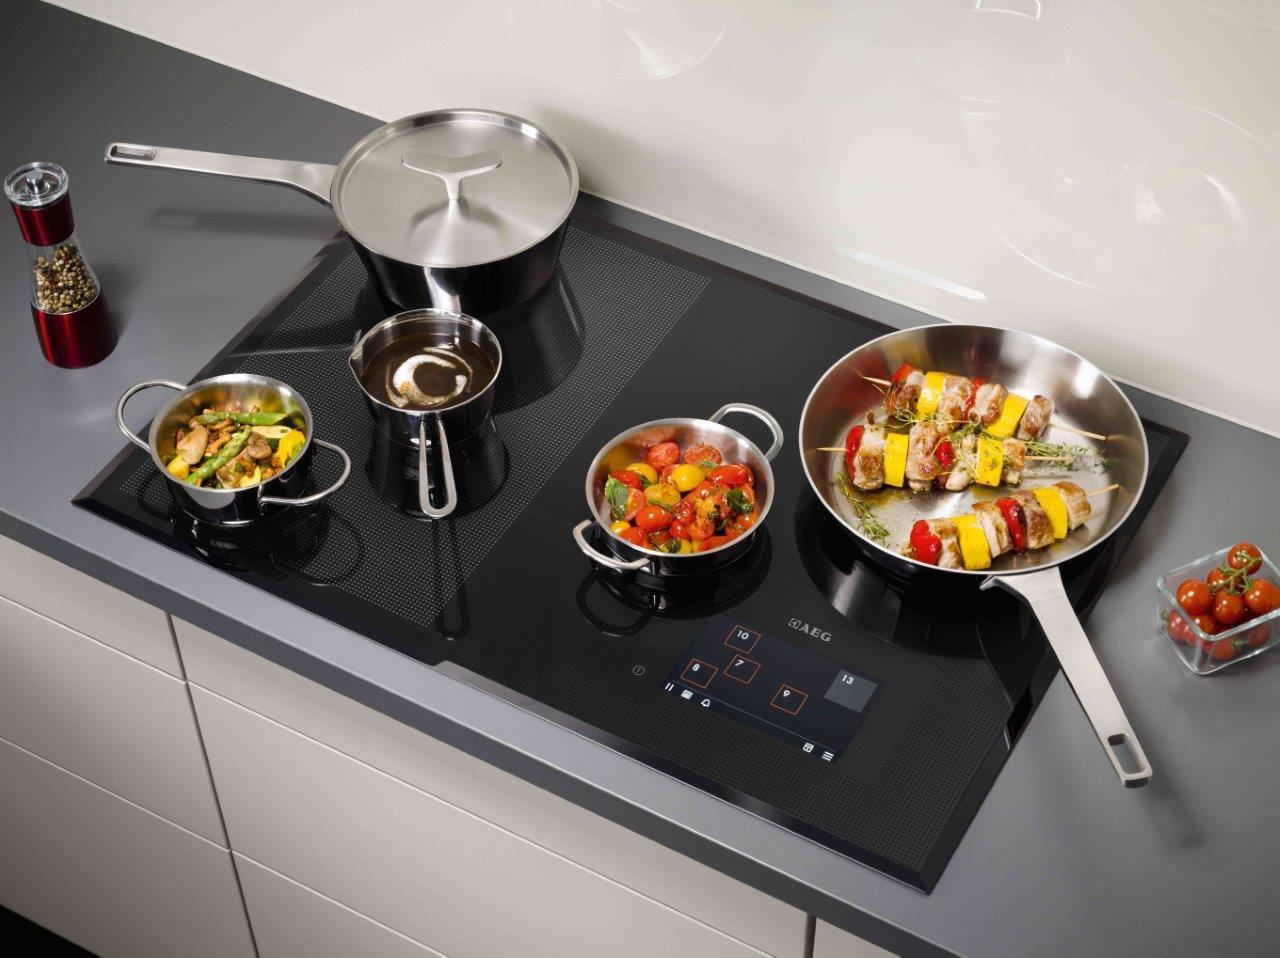 Фото посуды на индукционной плите